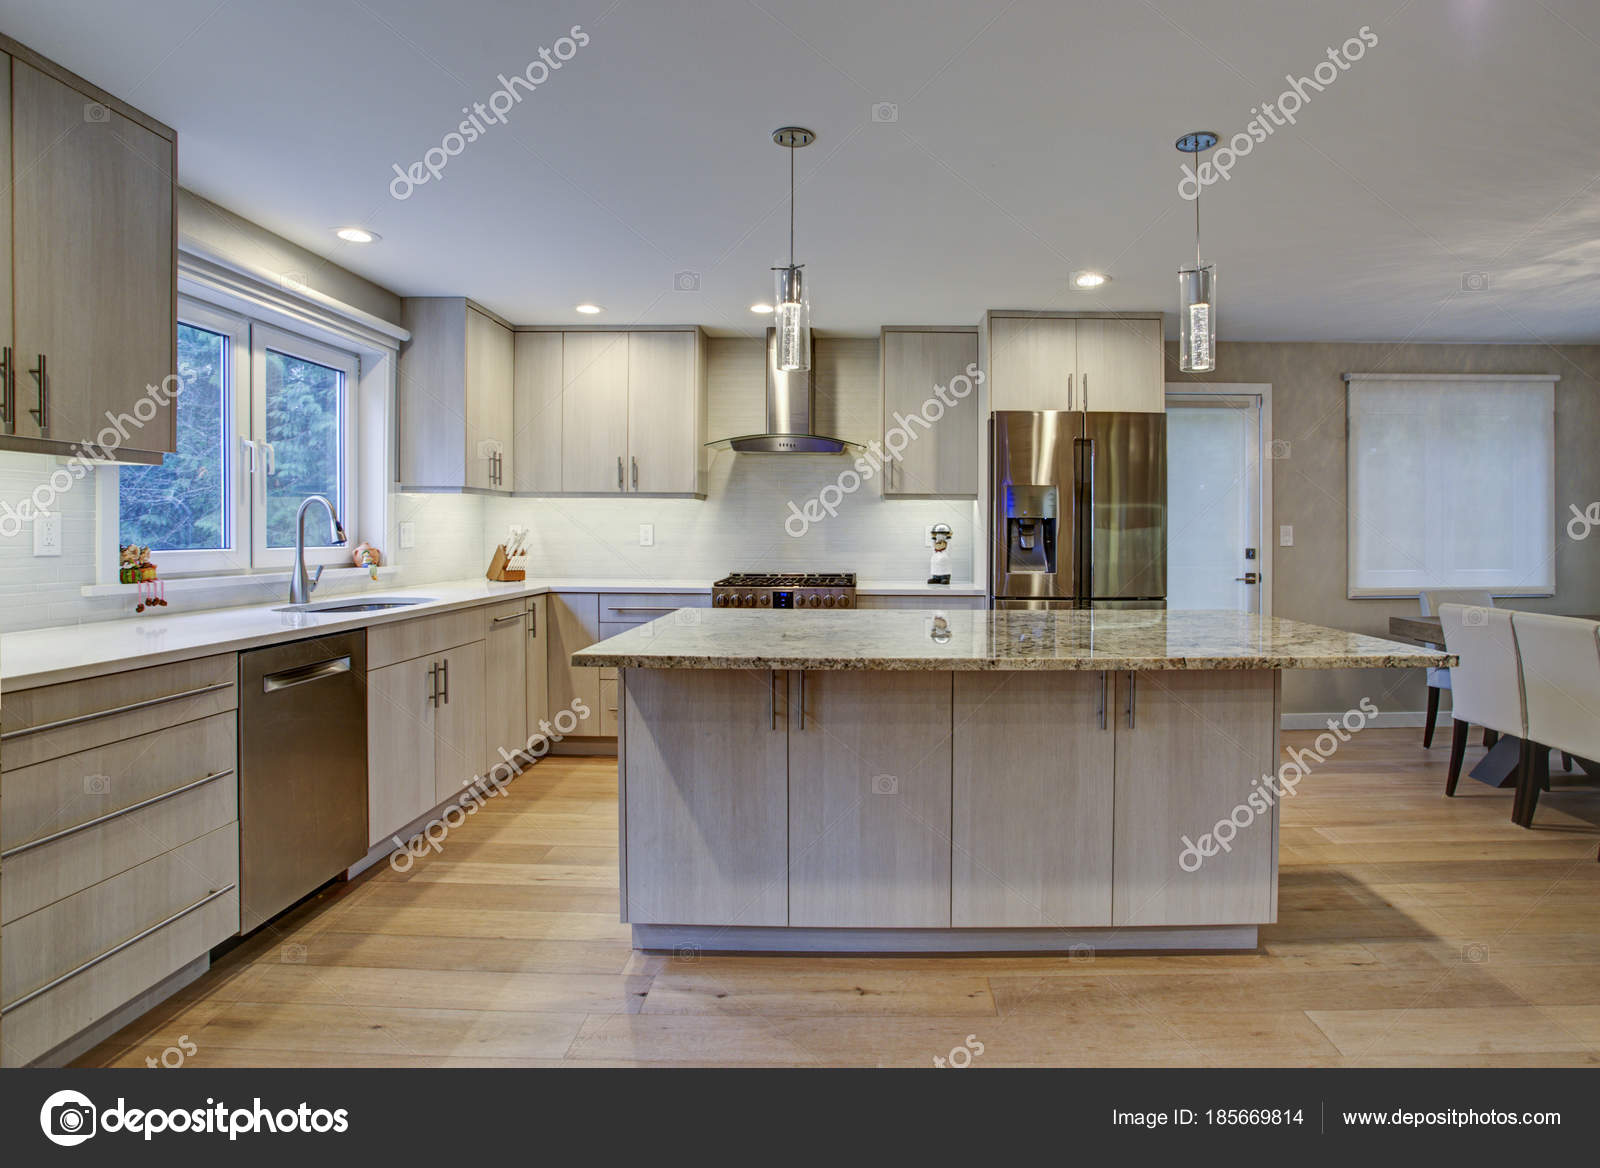 Camera bella cucina con isola di cucina — Foto Stock © alabn #185669814